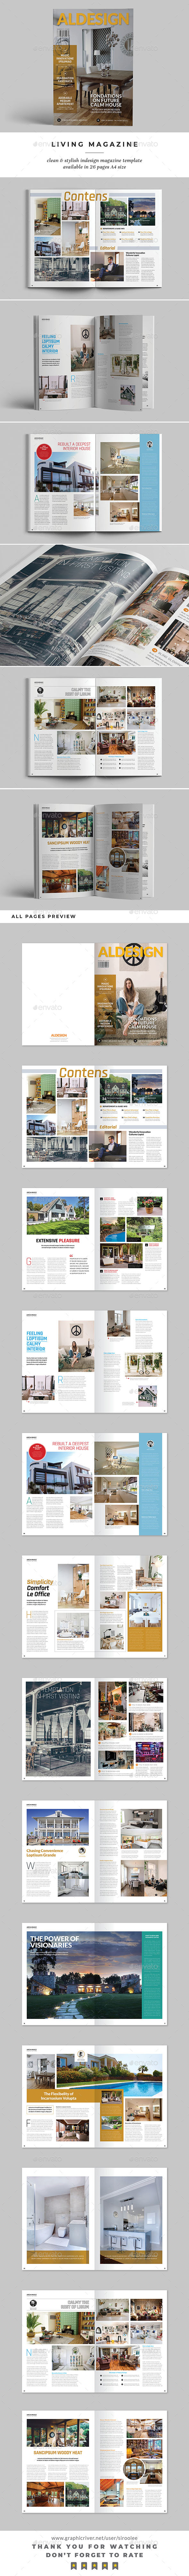 Living Magazine - Magazines Print Templates